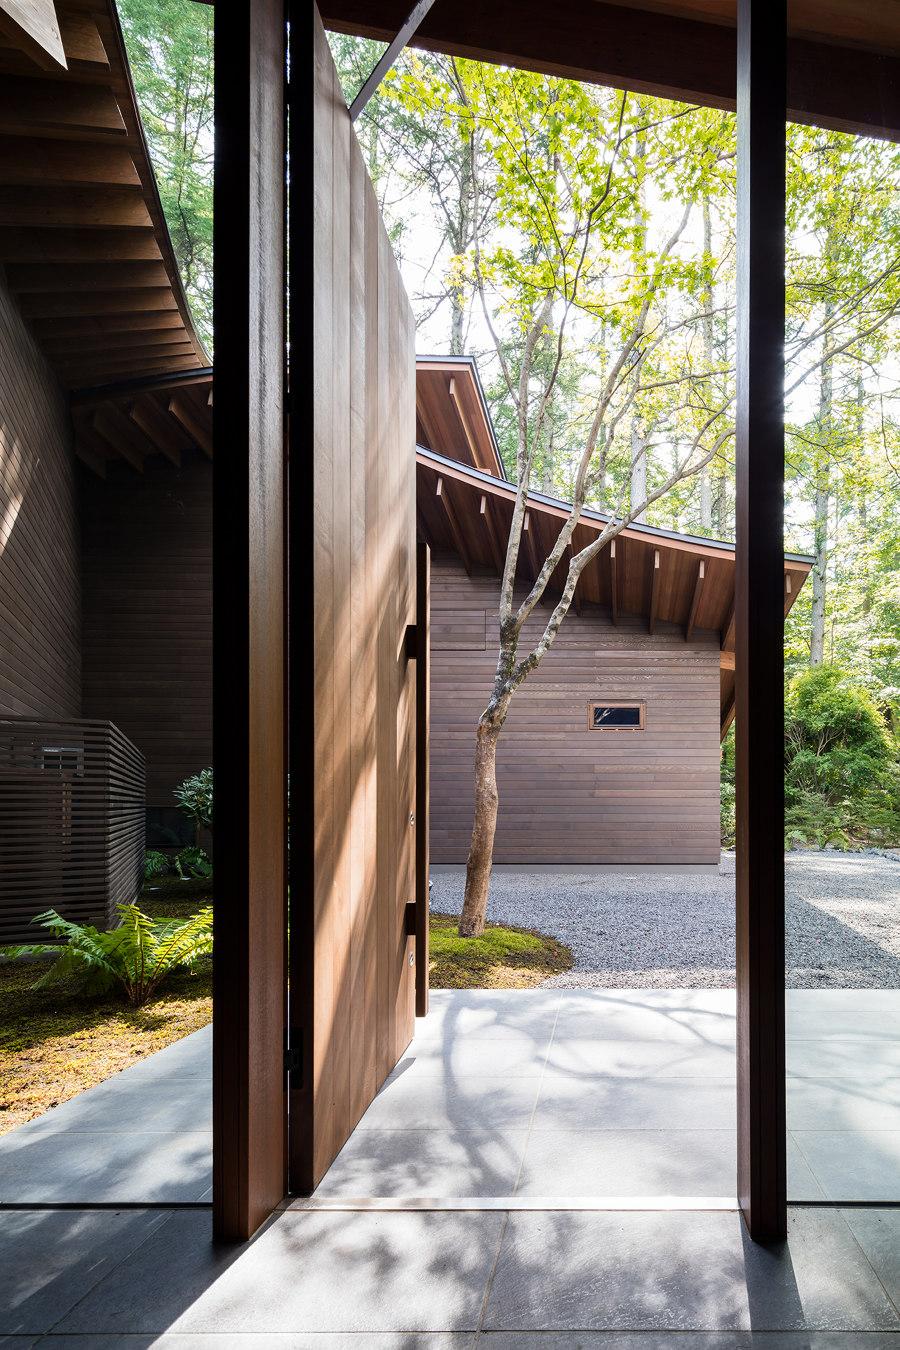 Four Leaves Villa by KIAS (Kentaro Ishida Architects Studio) | Detached houses